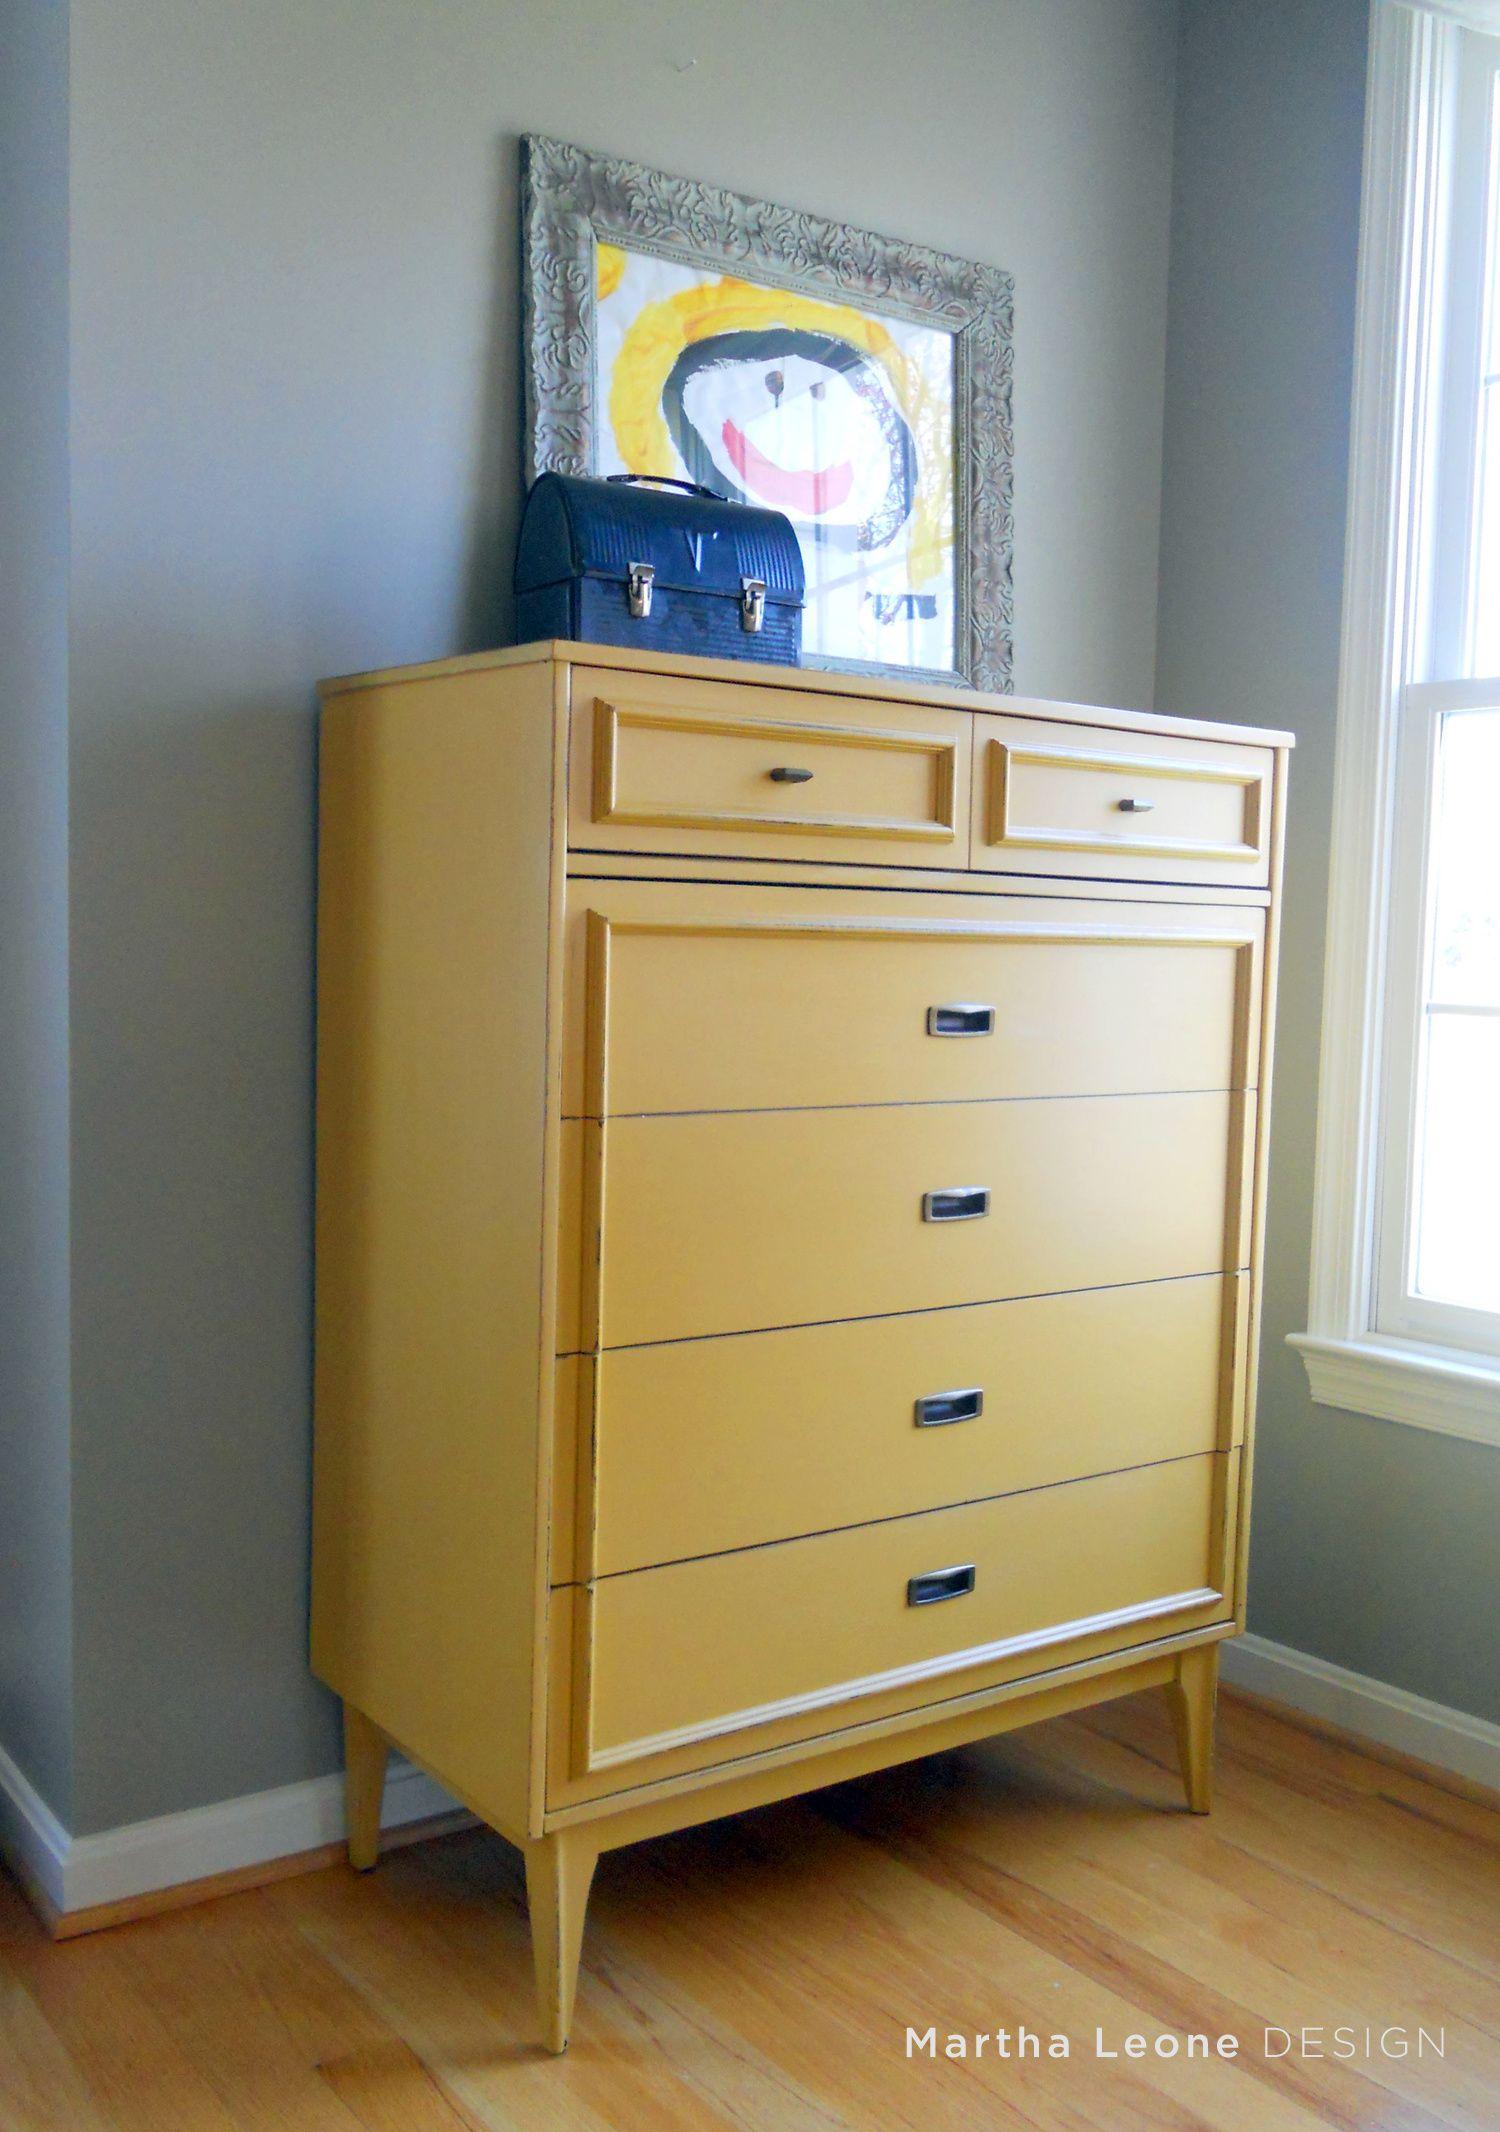 Etonnant Benjamin Moore Paint For Furniture   Best Bedroom Furniture Check More At  Http://cacophonouscreations.com/benjamin Moore Paint For Furniture/